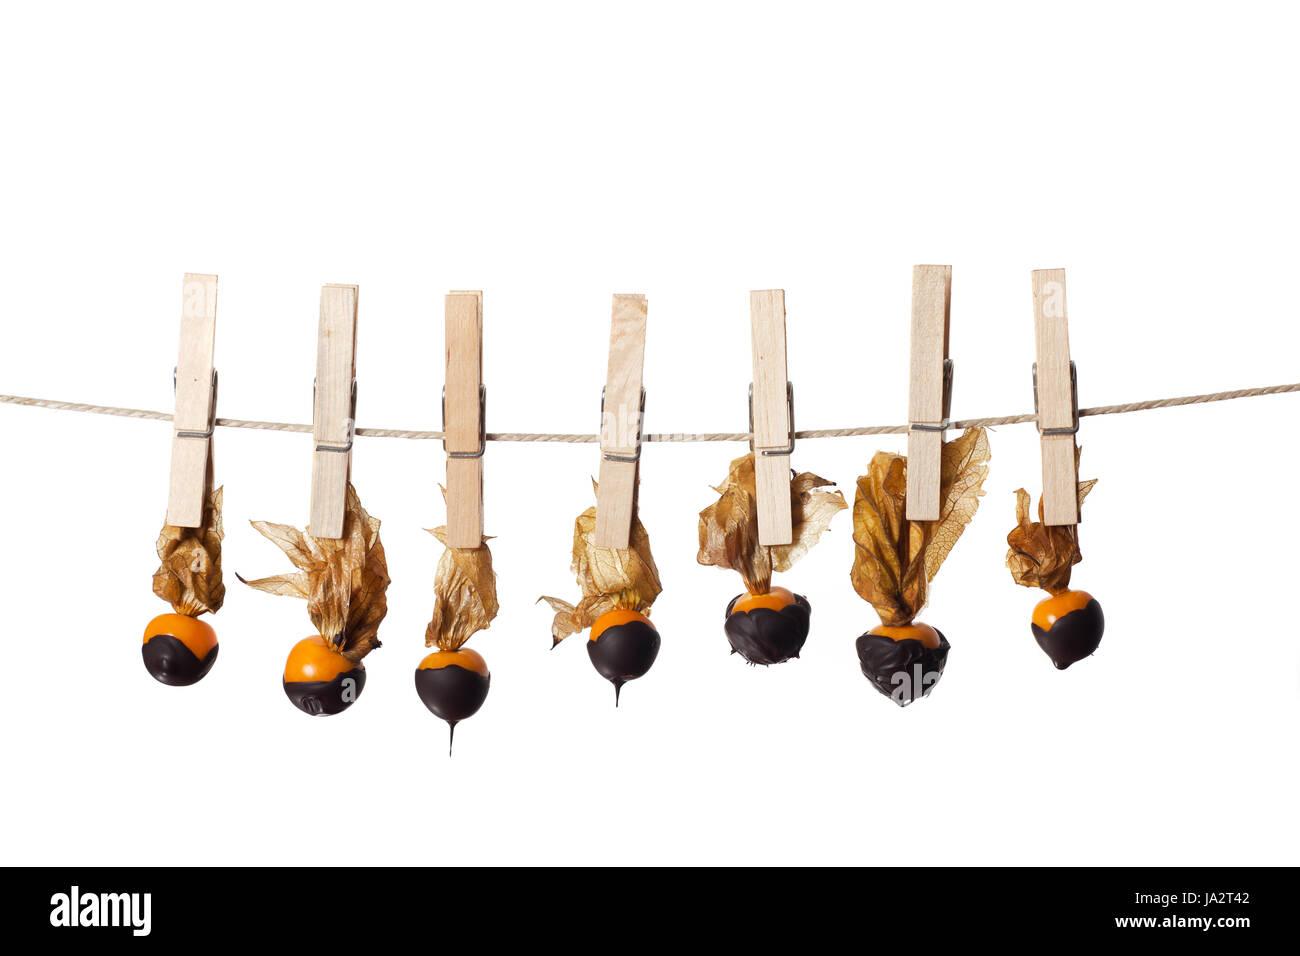 fruit, gooseberry, overdrawn, dessert, chocolate, sweetly, brown, brownish, - Stock Image